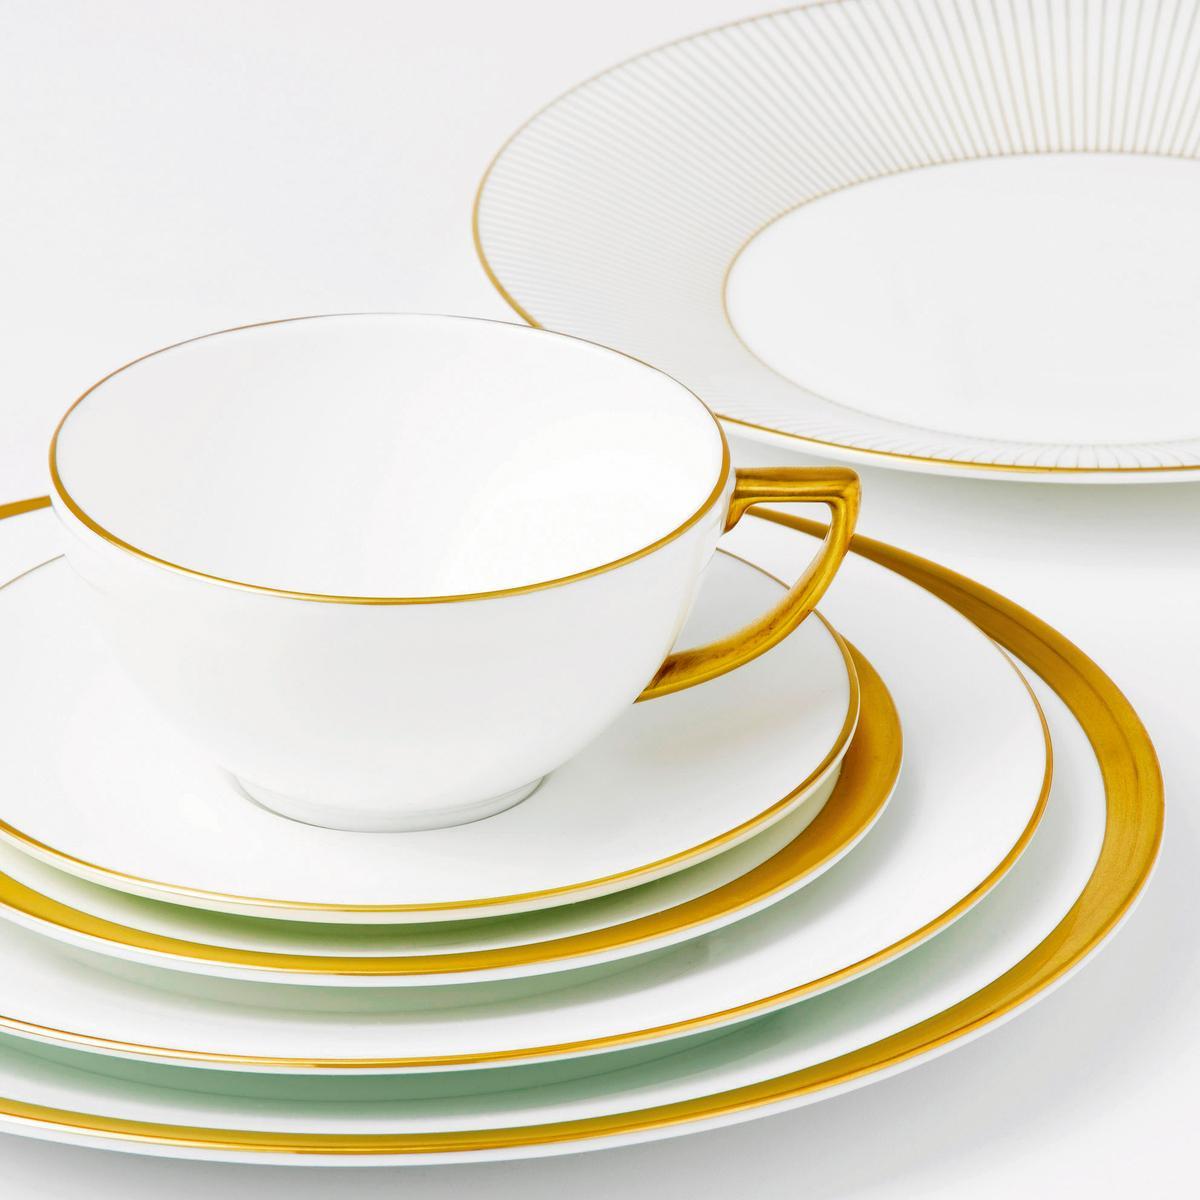 About this product range  sc 1 st  Artedona & Wedgwood Jasper Conran Gold Dinnerware | Artedona.com